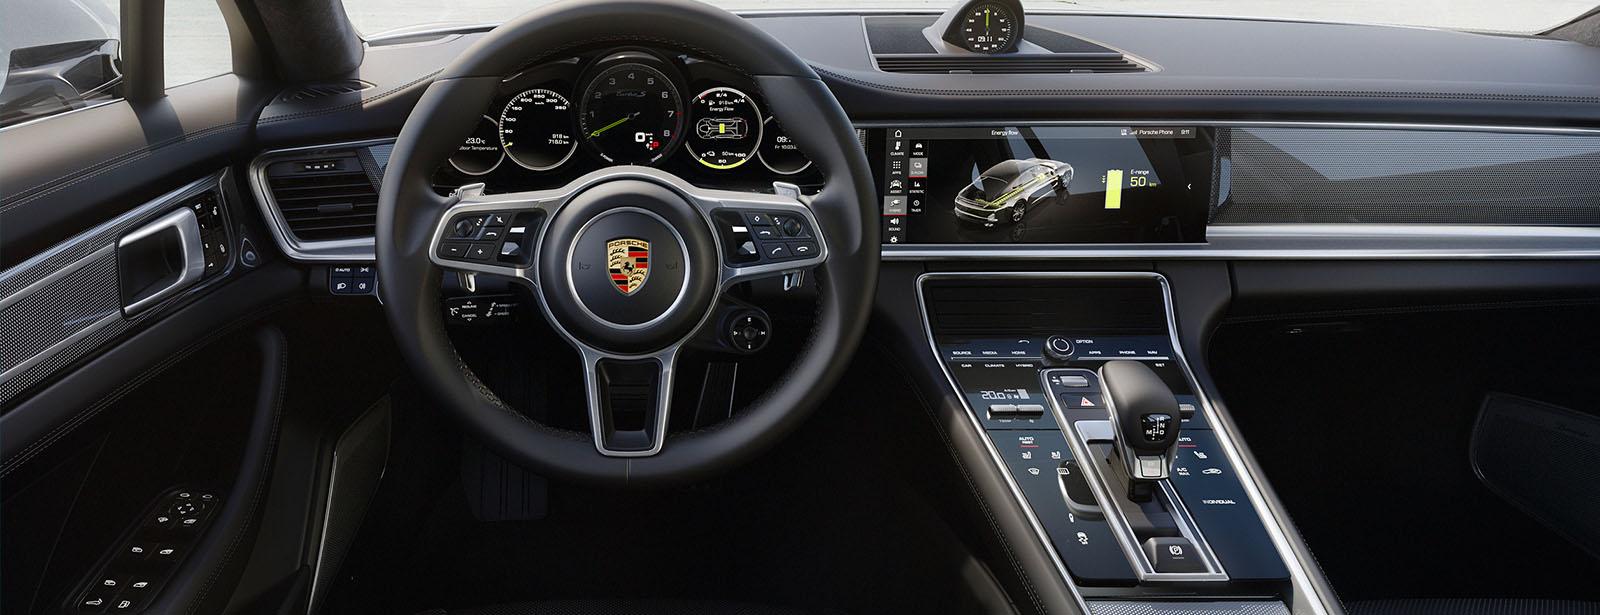 Porsche Advanced Cockpit With Hybrid Specific Displays The New Porsche Panamera Turbo S E Hybrid